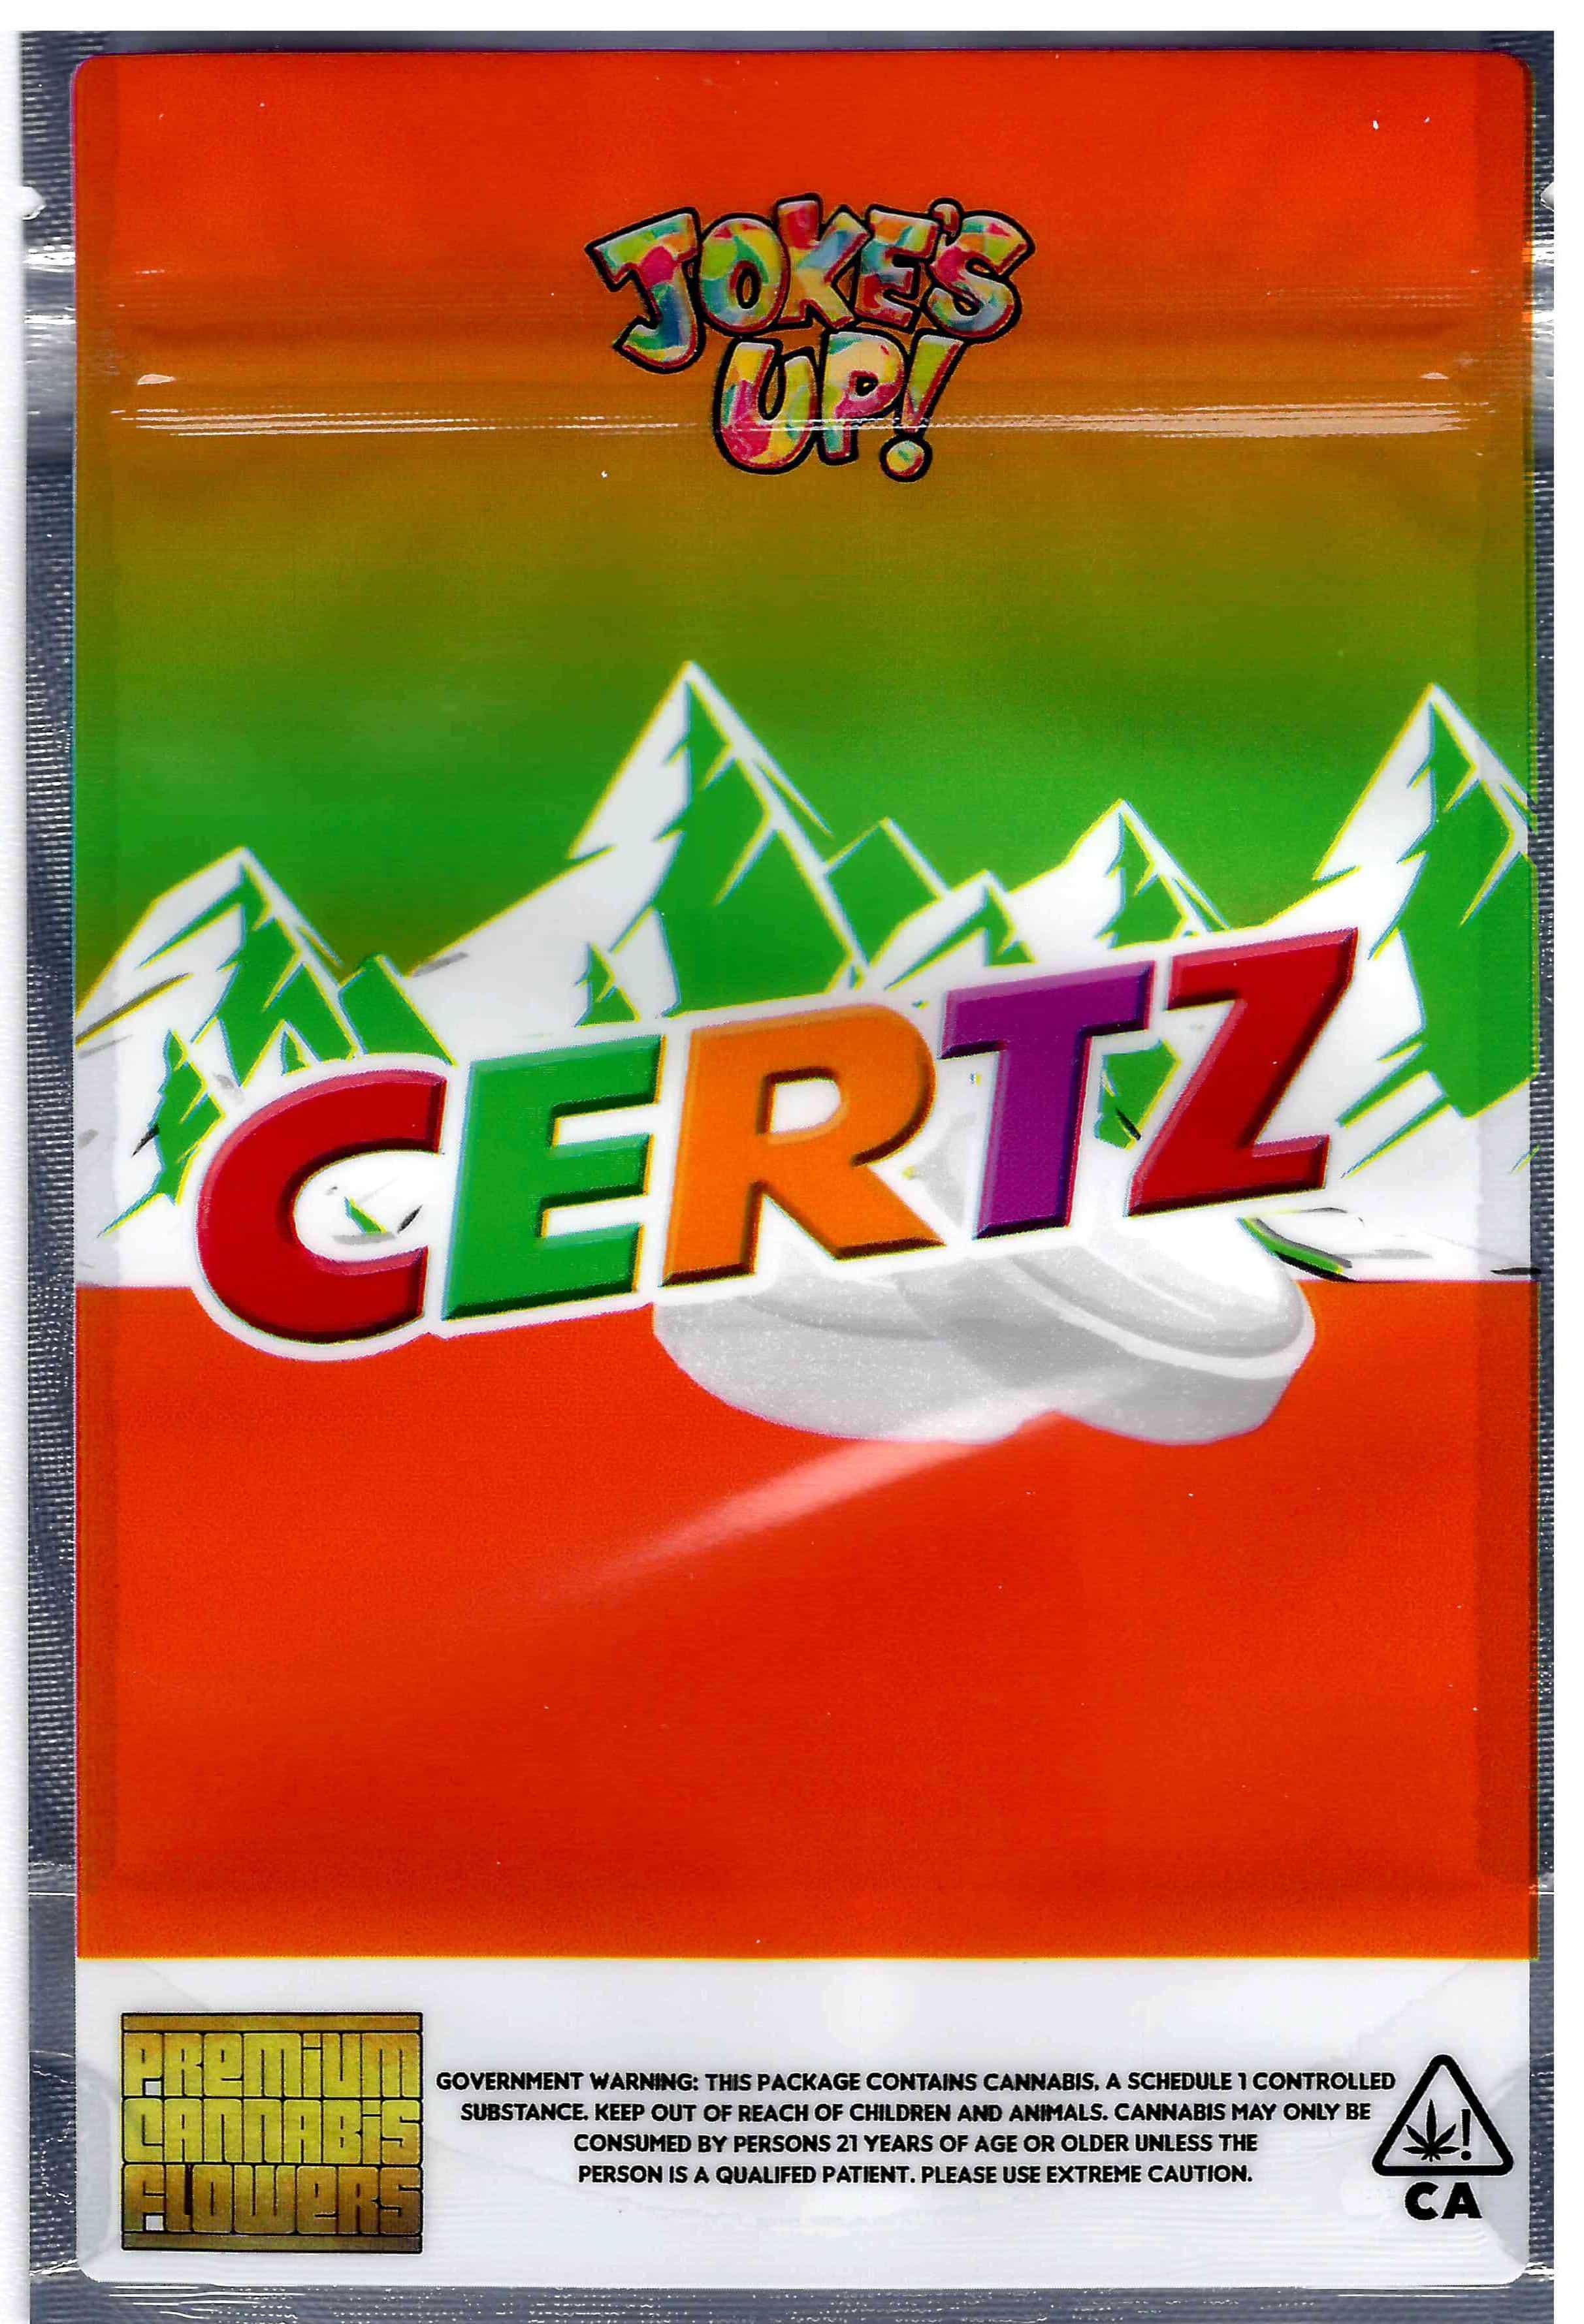 Certz 3.5G 7G Mylar Bags Jokes Up Cookies Runtz gas House